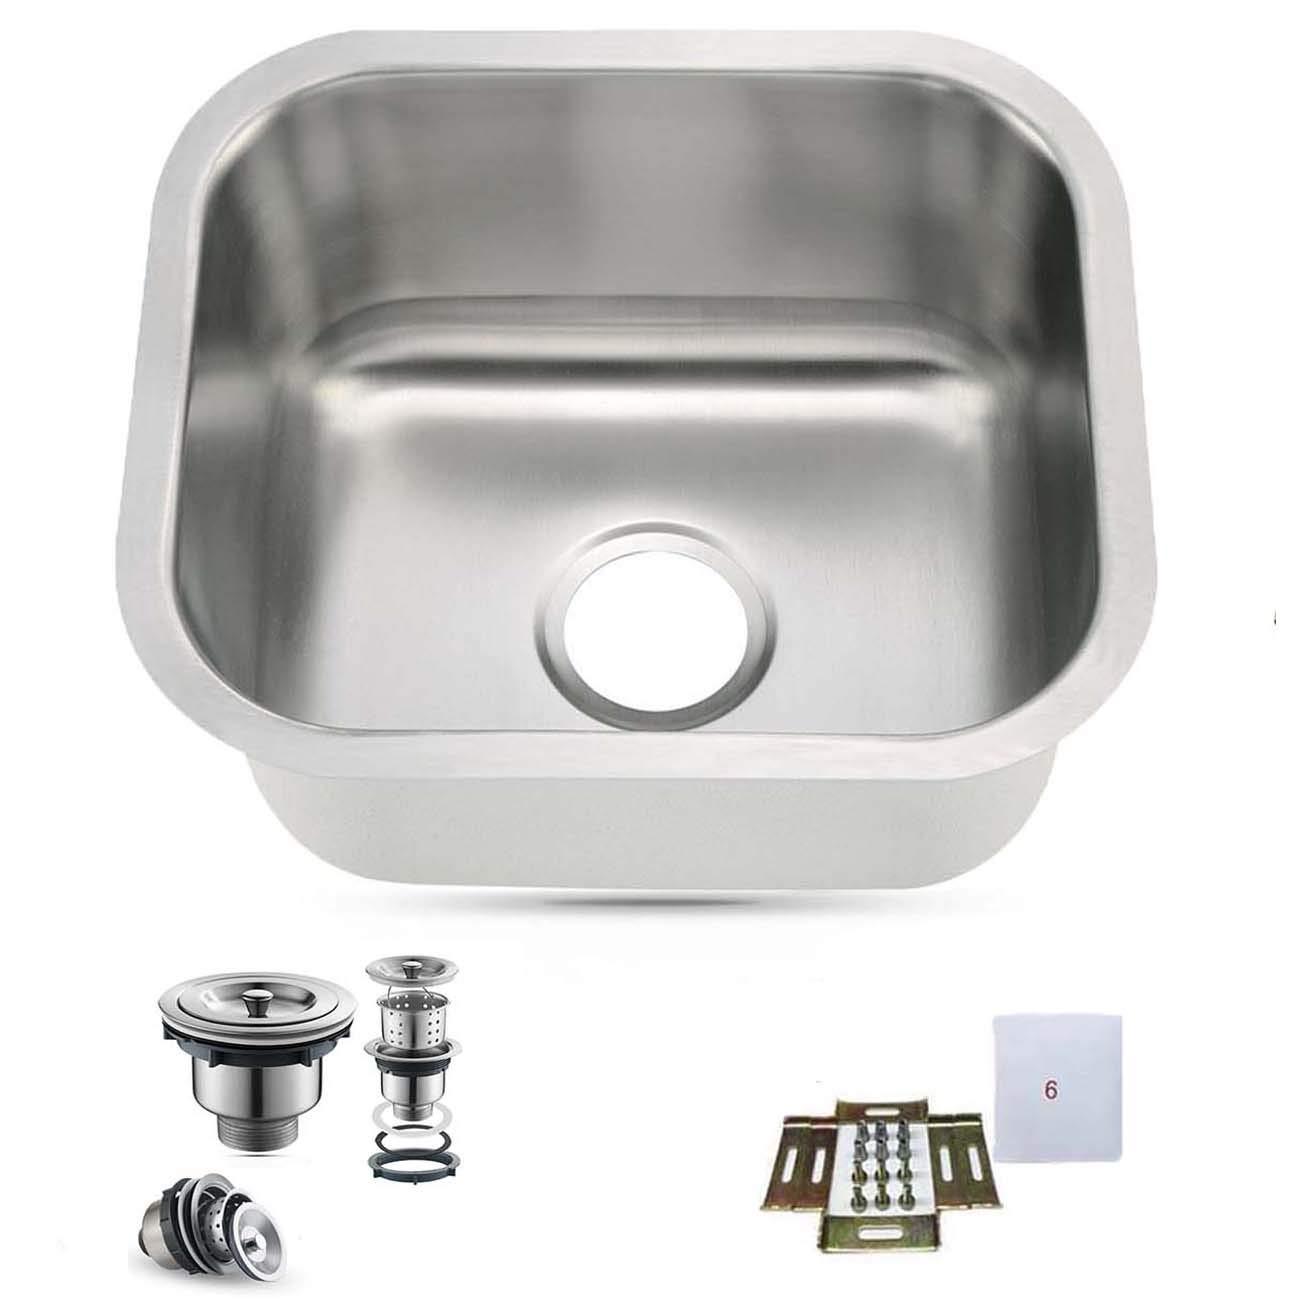 15''X13'' Undermount Single Bowl 304-Stainless Steel Small Bar/Prep Sink 18Gauge